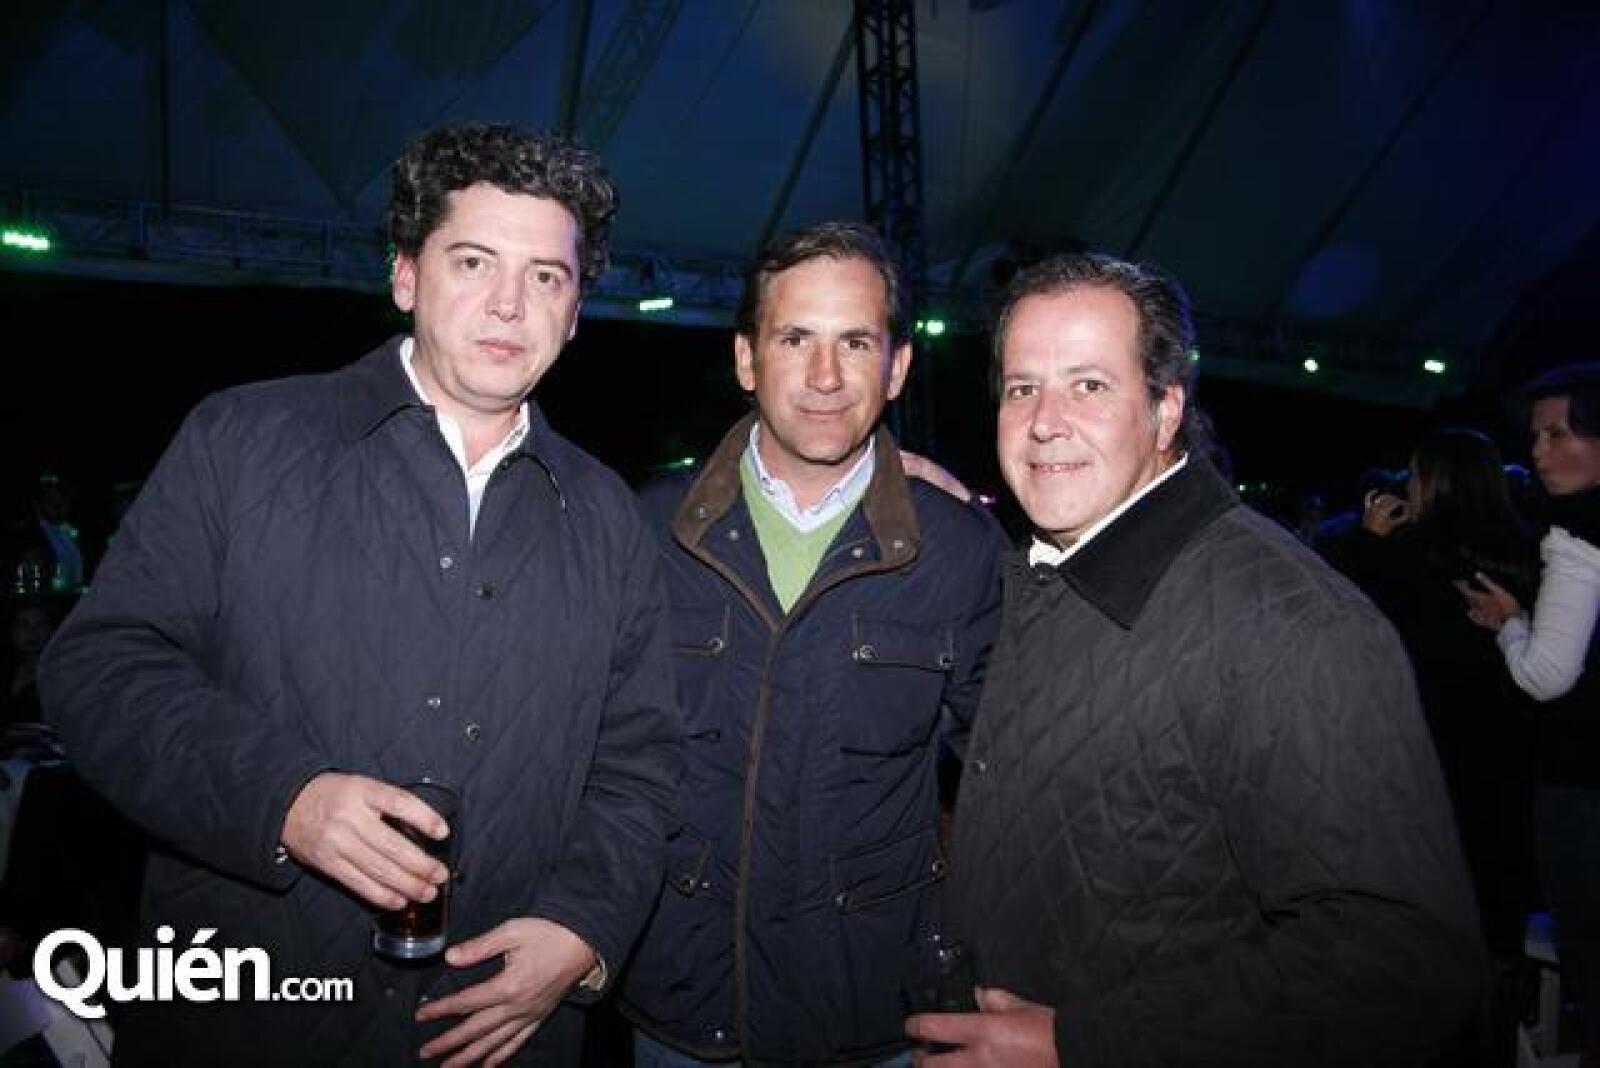 Guillermo Moreno,Alfonso Gutiérrez,Luis Martínez Vértiz